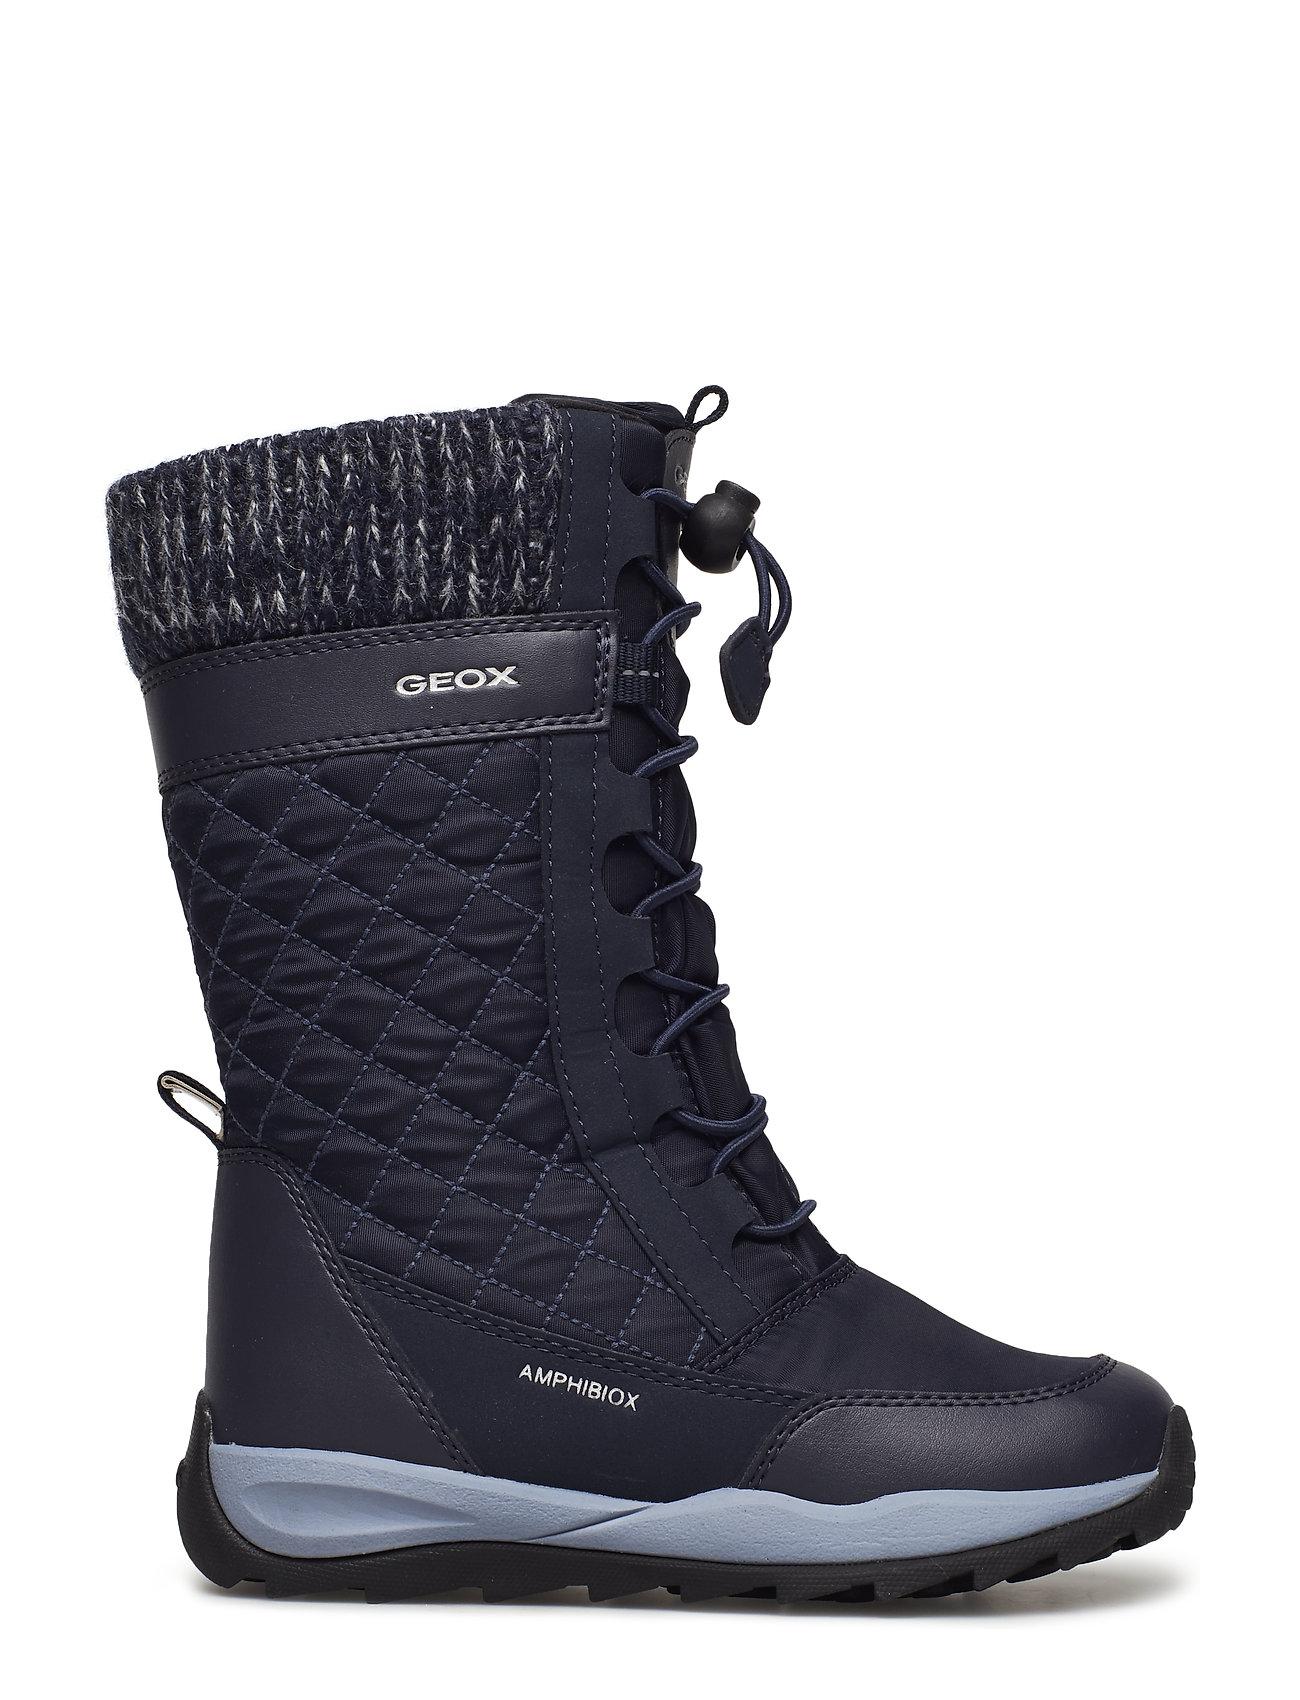 J Orizont B Girl Abx Vinterstøvler Med Snøre Sort GEOX